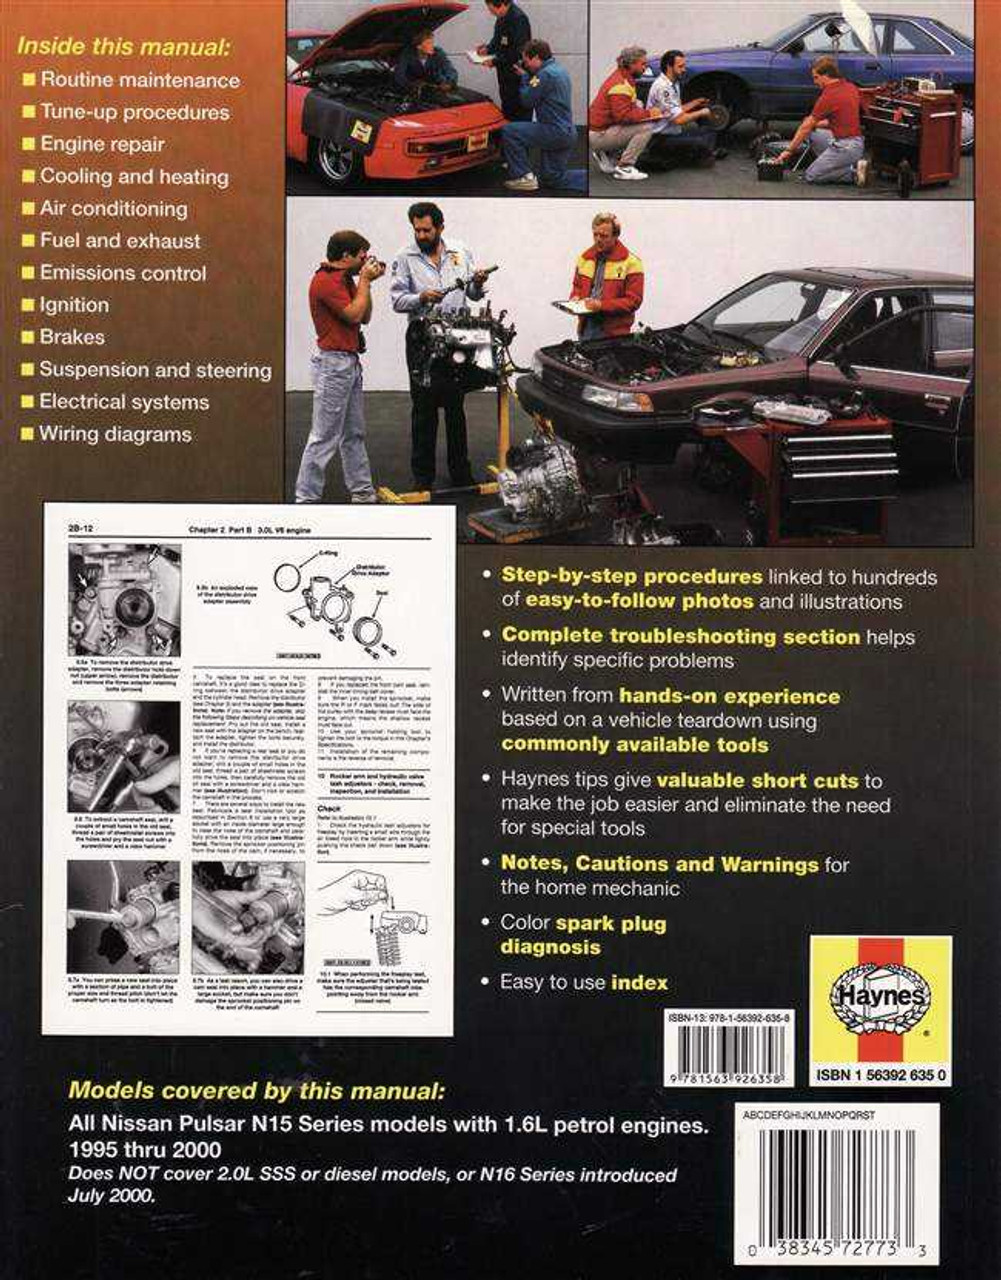 nissan pulsar n14 workshop manual